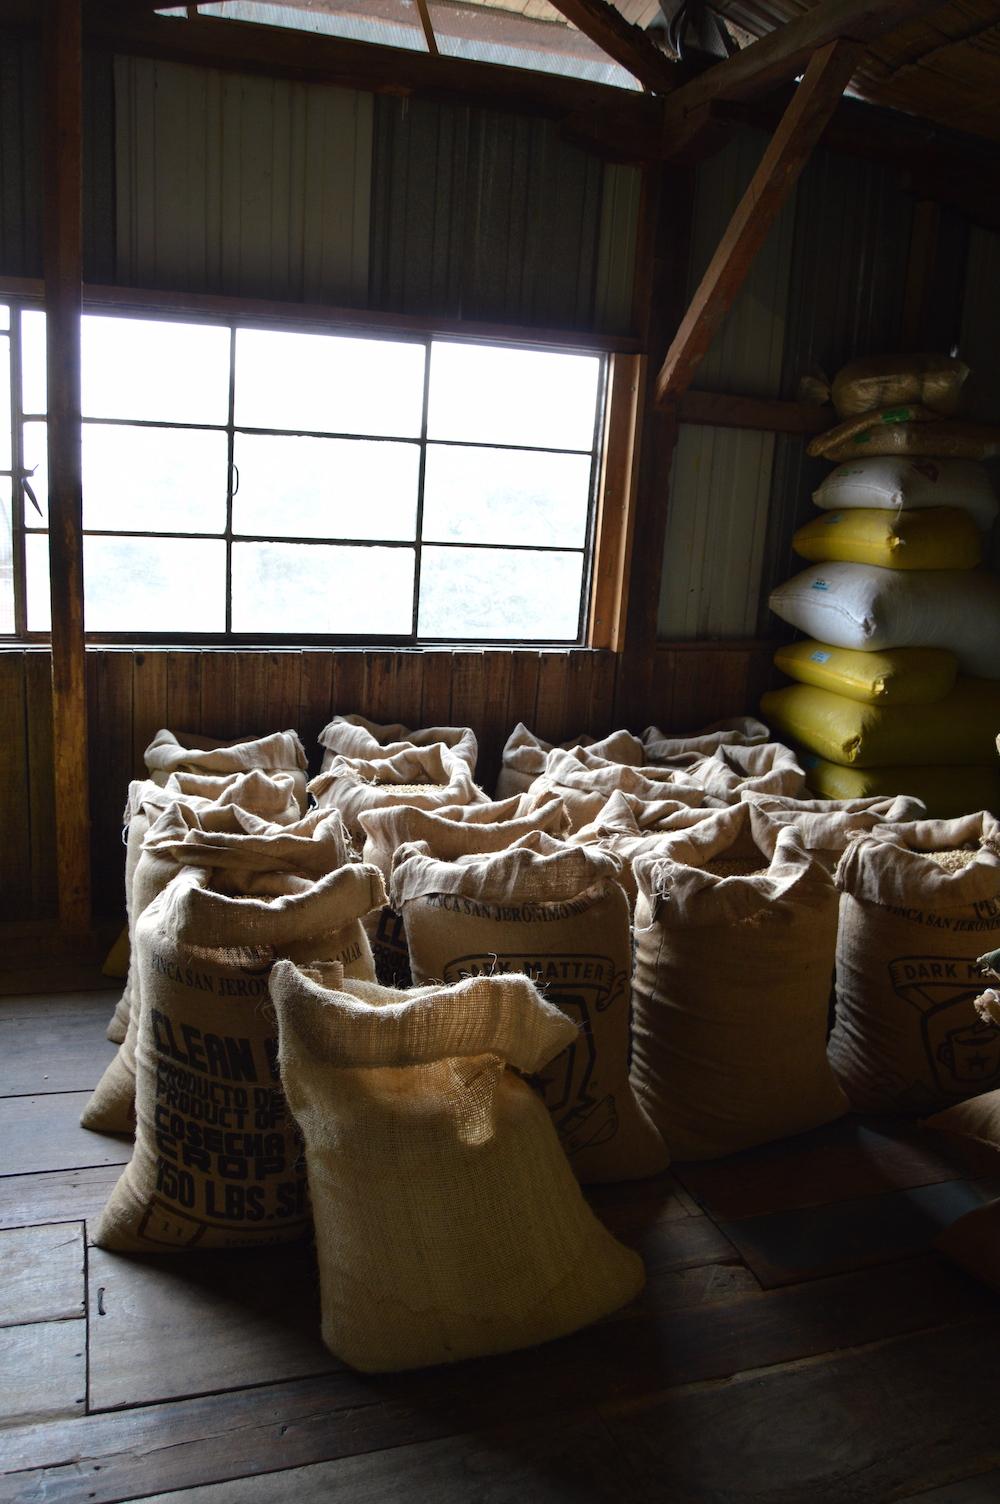 Bags of coffee at Finca San Jerónimo Miramar